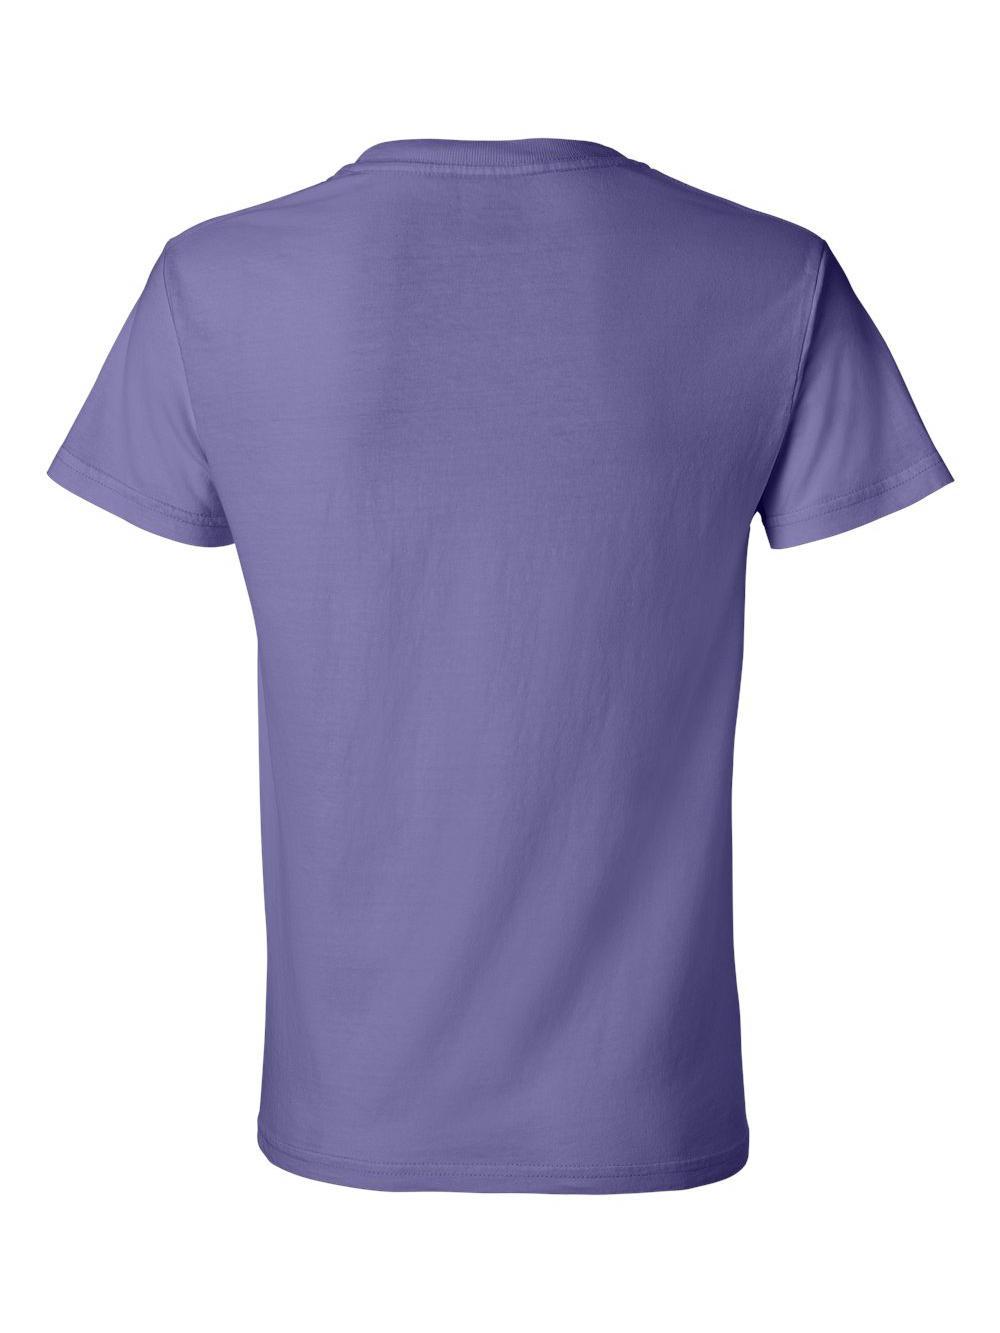 Comfort-Colors-Pigment-Dyed-Ringspun-Women-039-s-Short-Sleeve-T-Shirt-3333 thumbnail 31